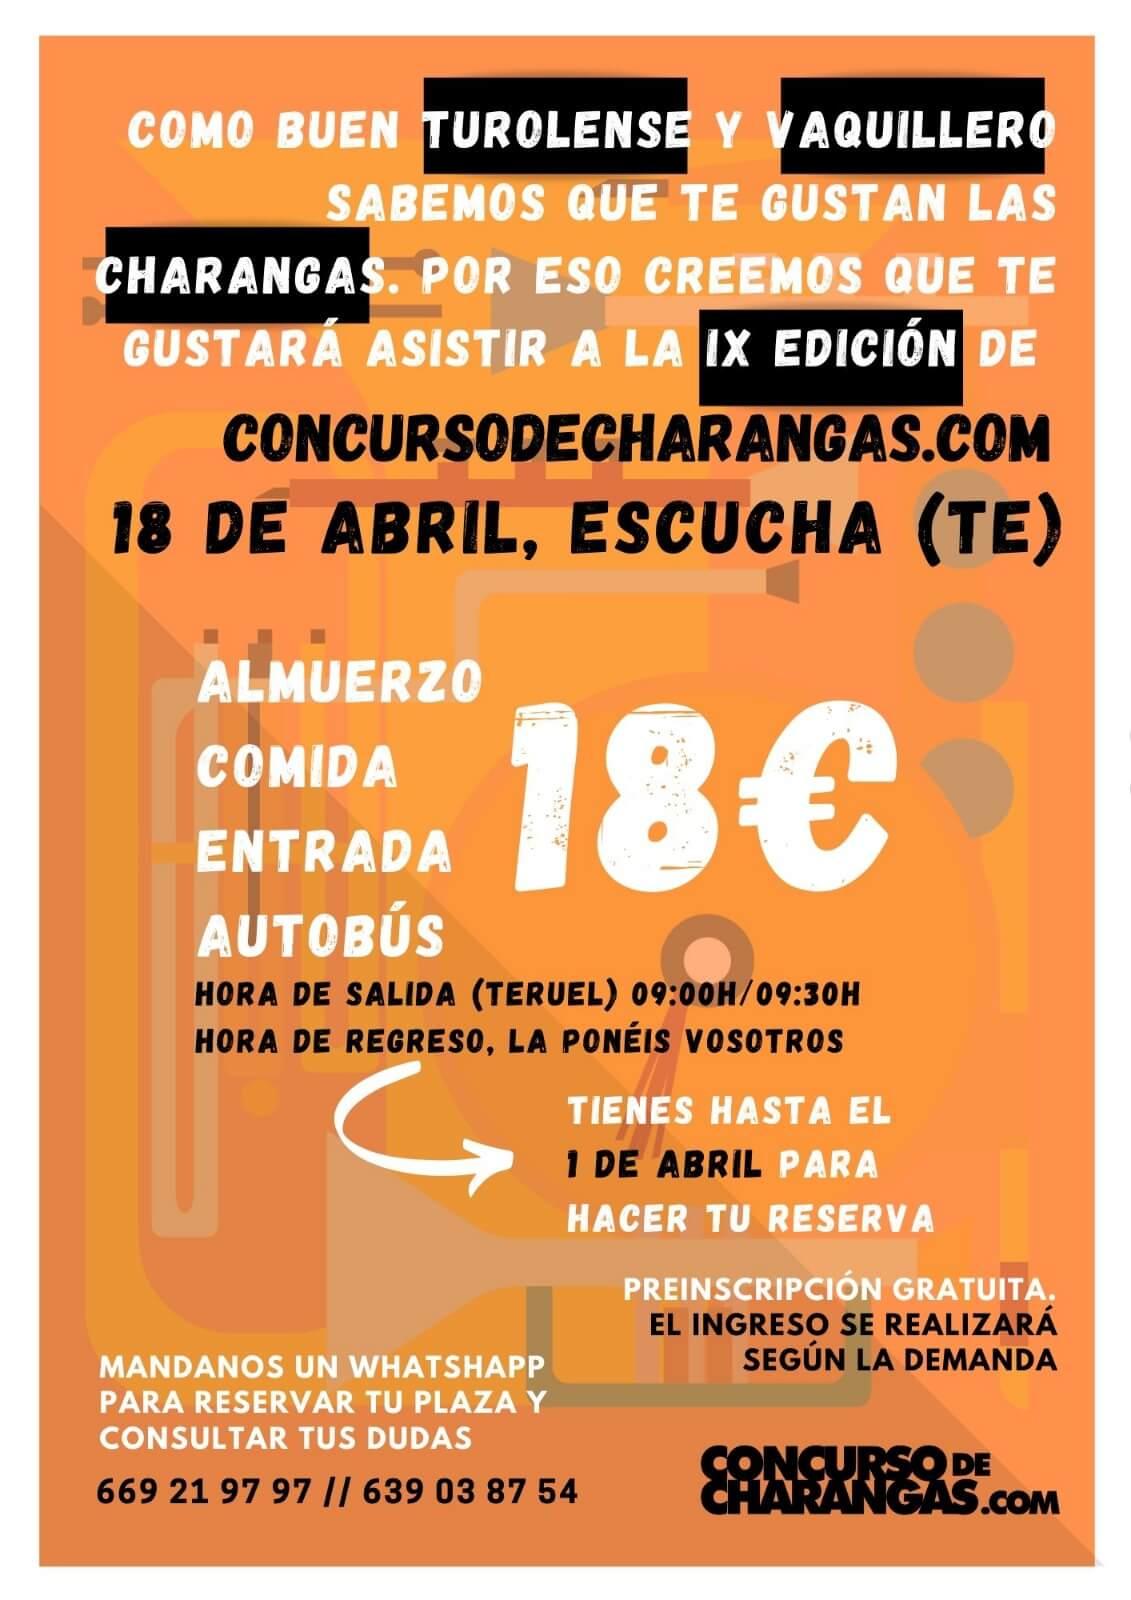 Autobús desde Teruel. Concurso de Charangas de Escucha (Teruel)